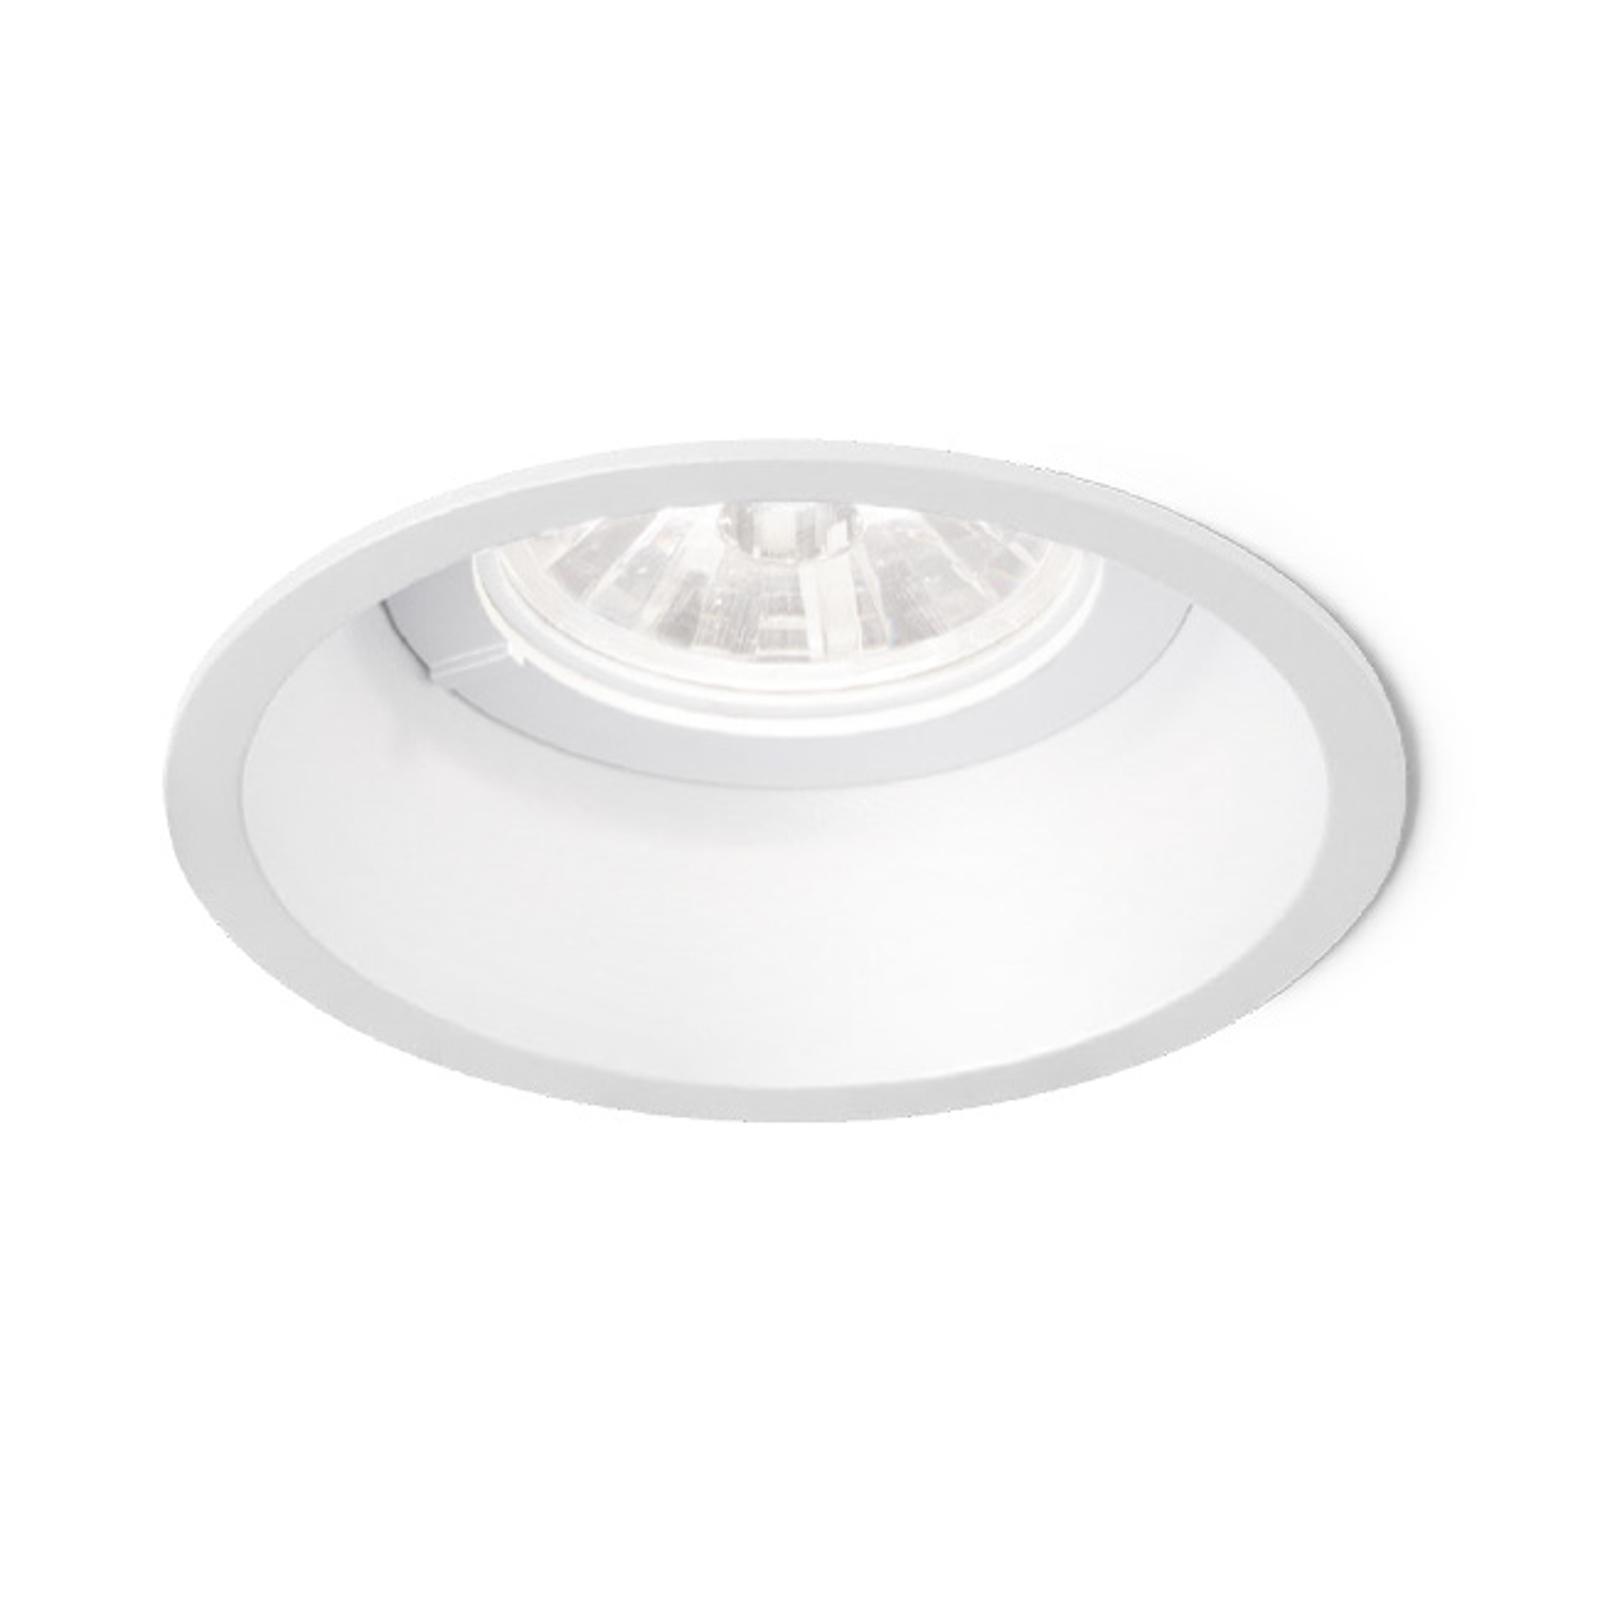 WEVER & DUCRÉ Deep 1.0 Einbaulampe 2.700K weiß